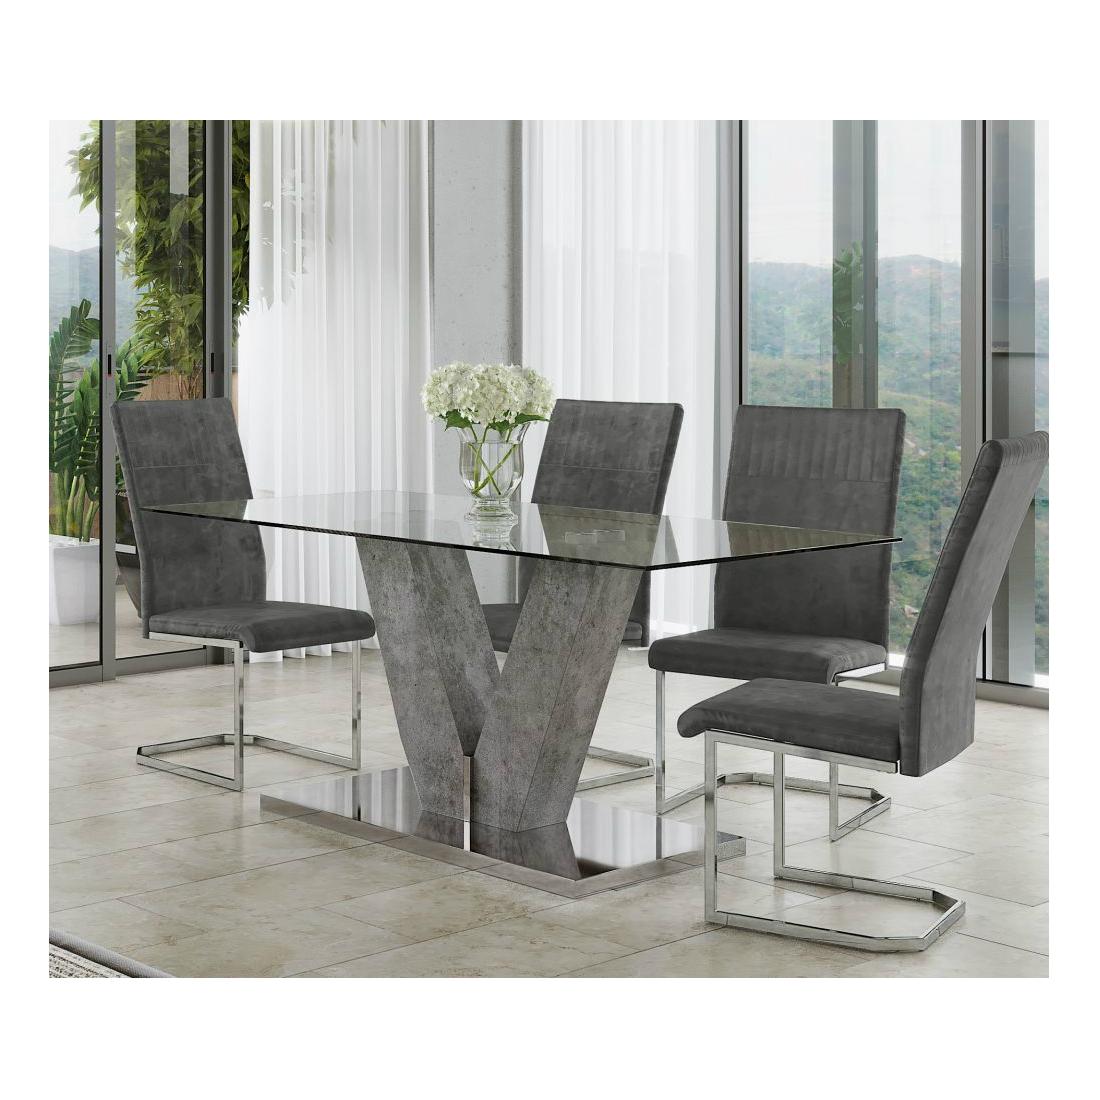 Cadence dining table